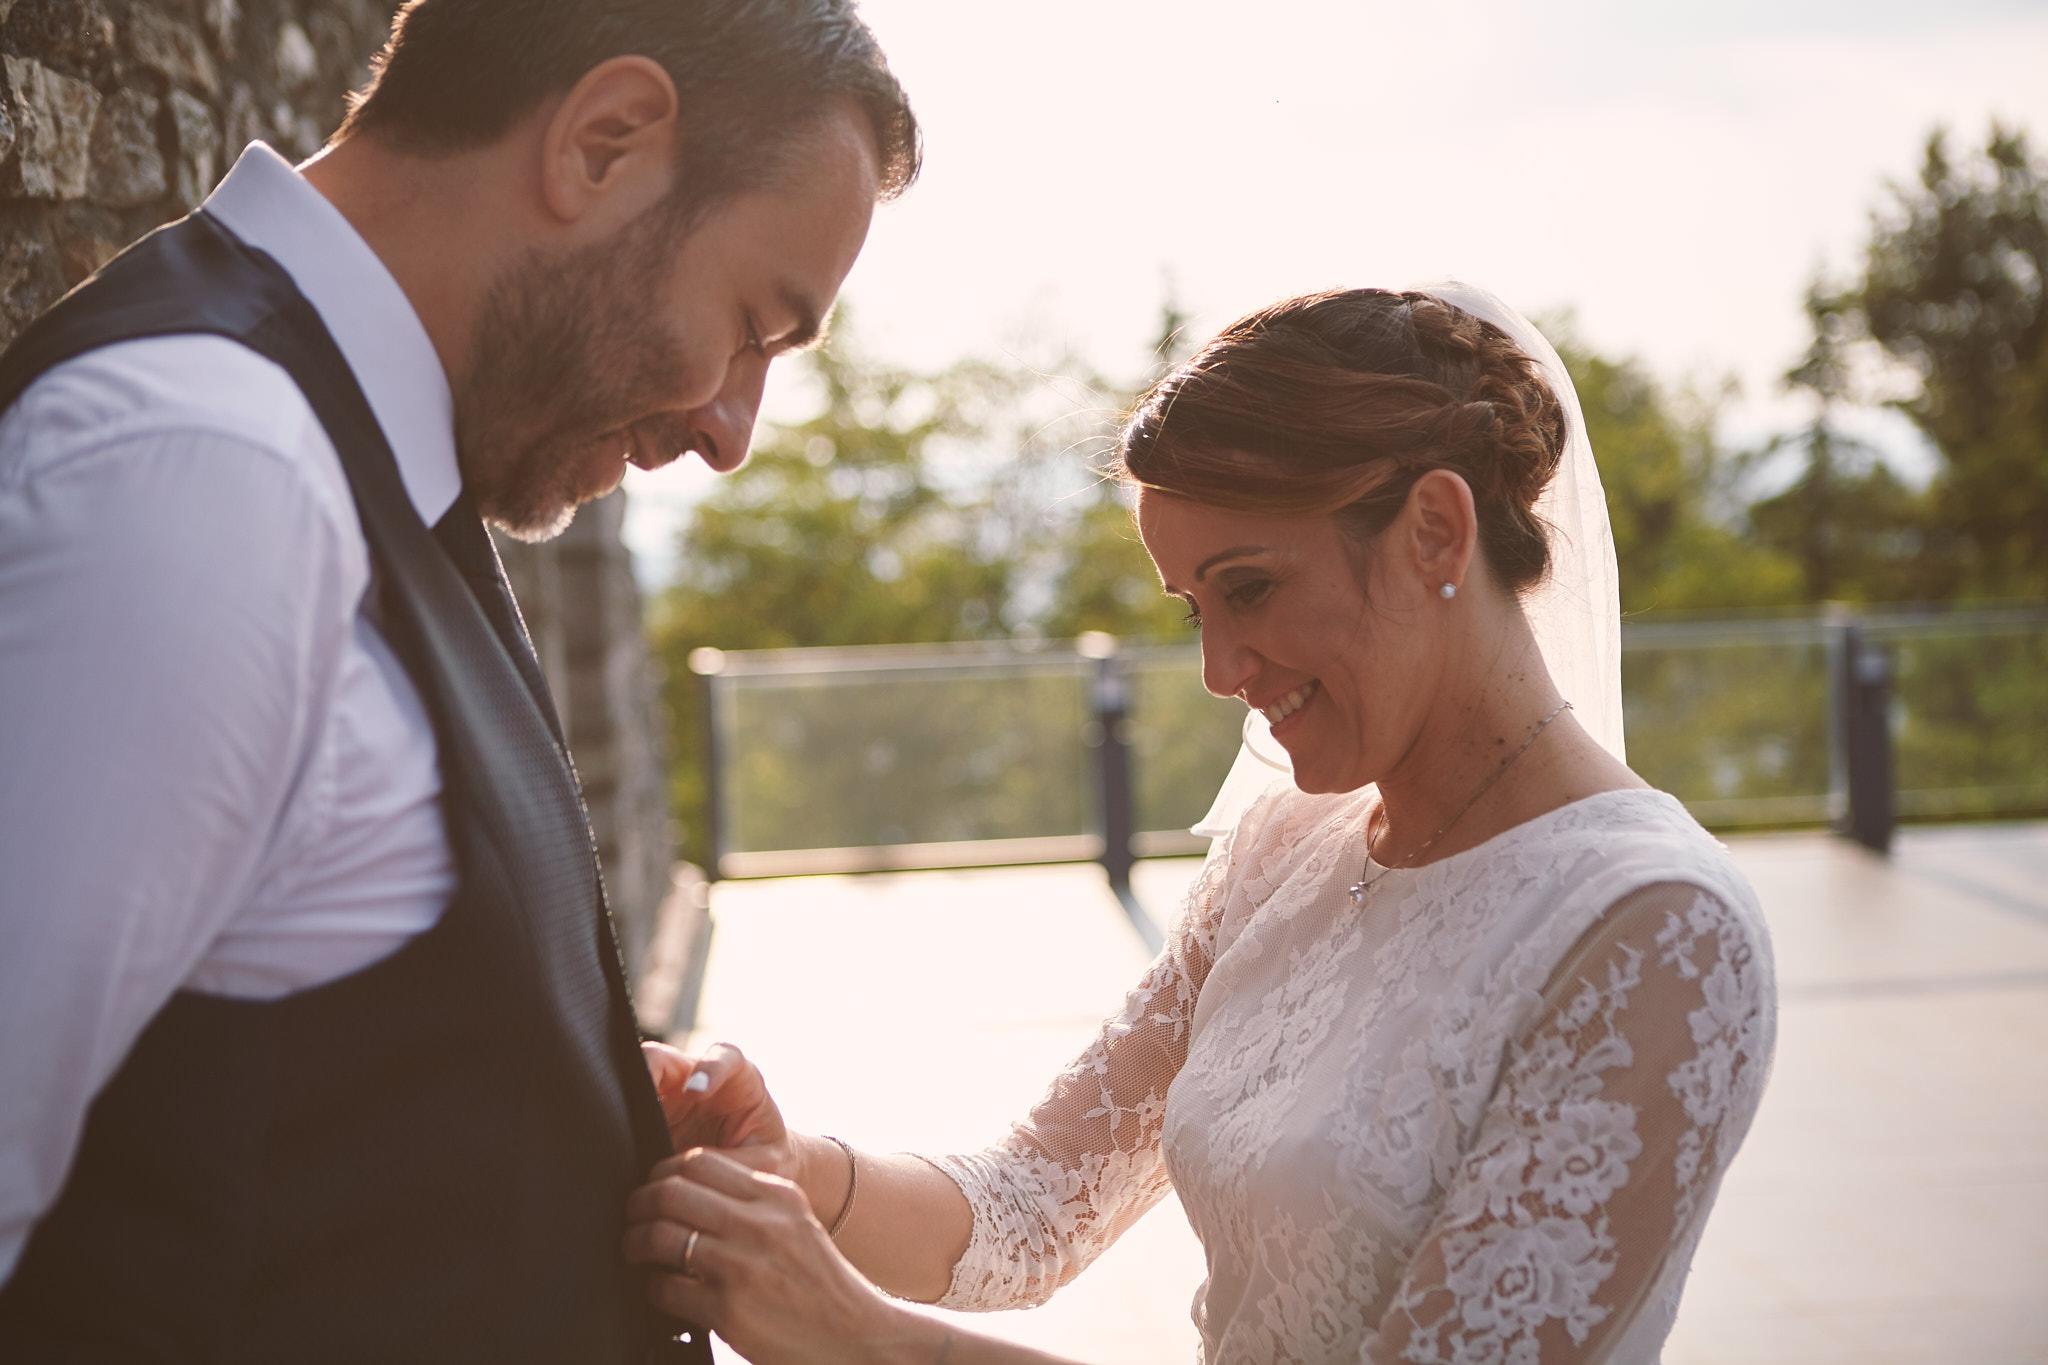 Wedding plannig, stress, COVID and burnout